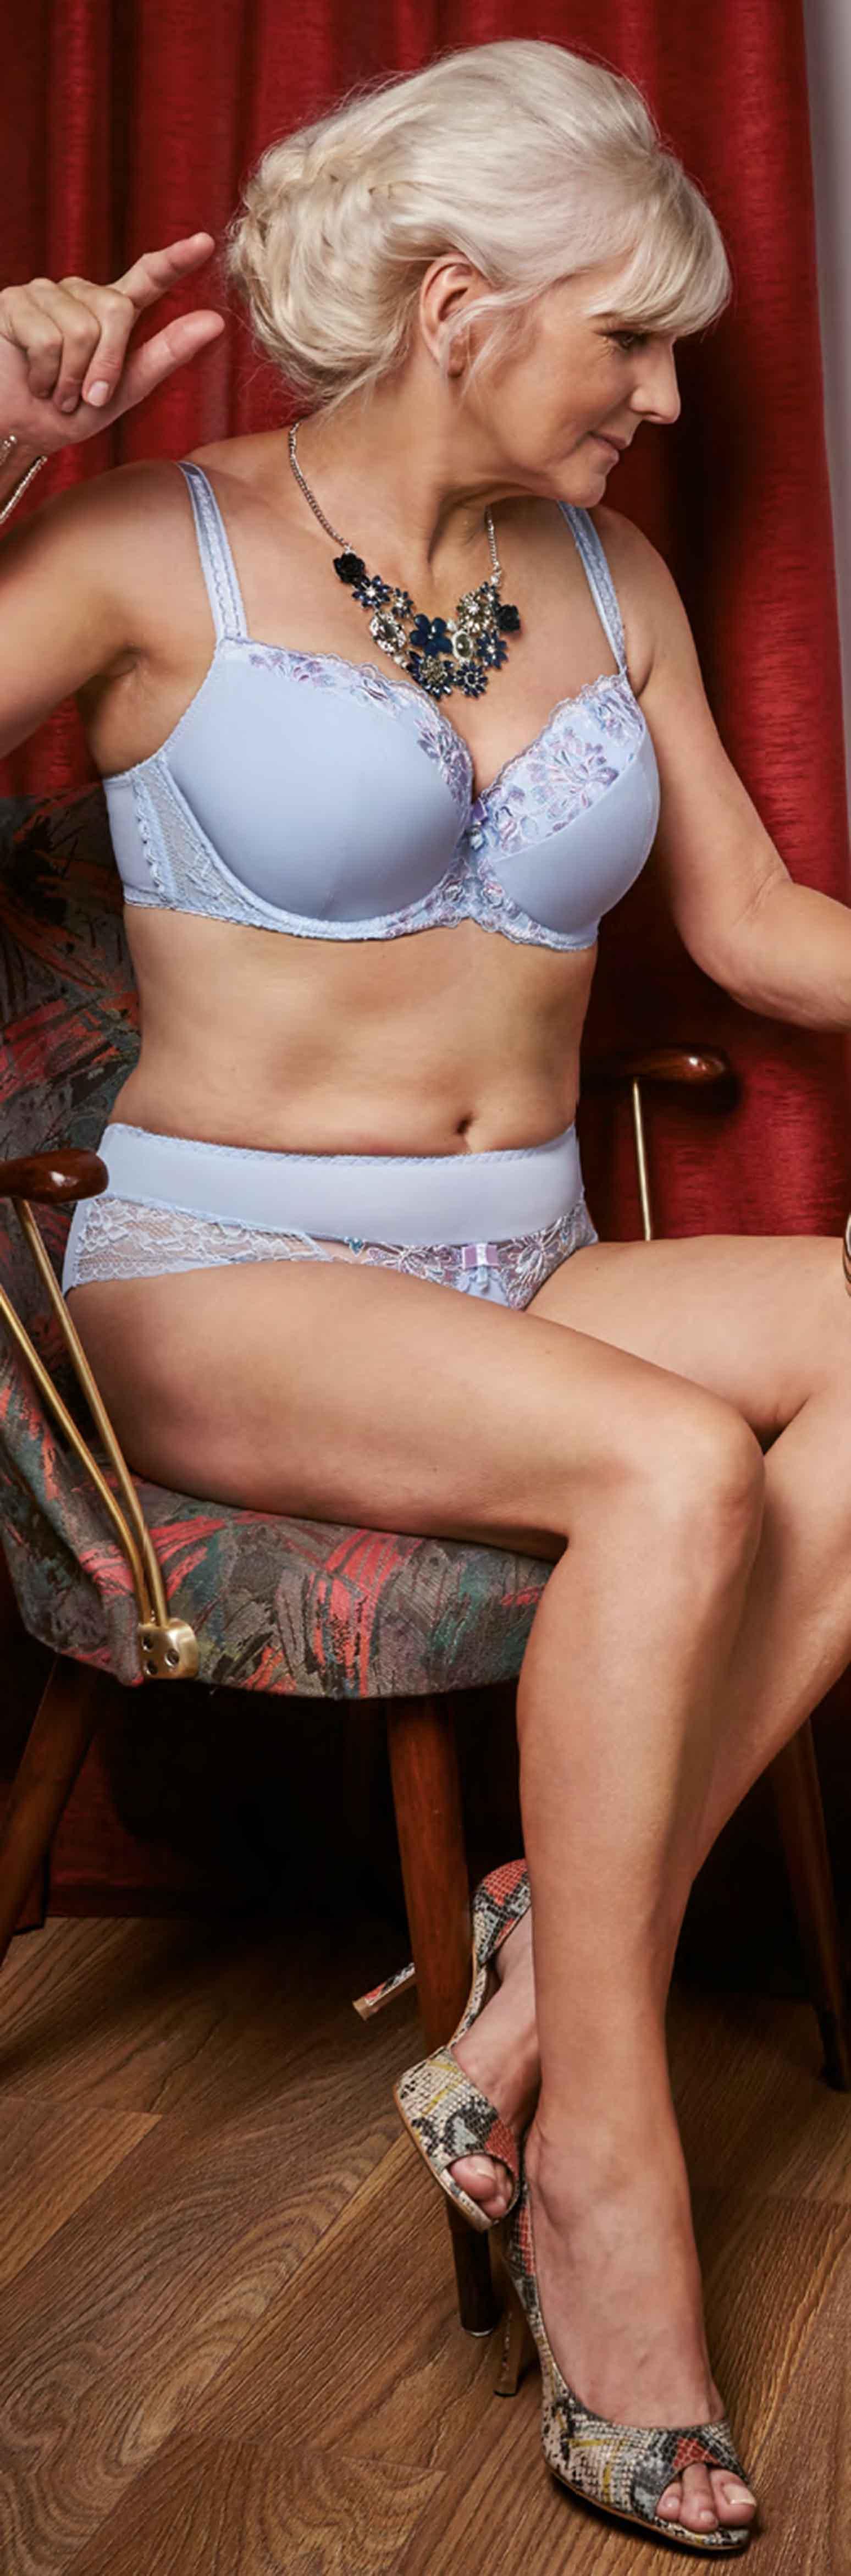 pinveronica lawson on mature and feminine ladies   pinterest